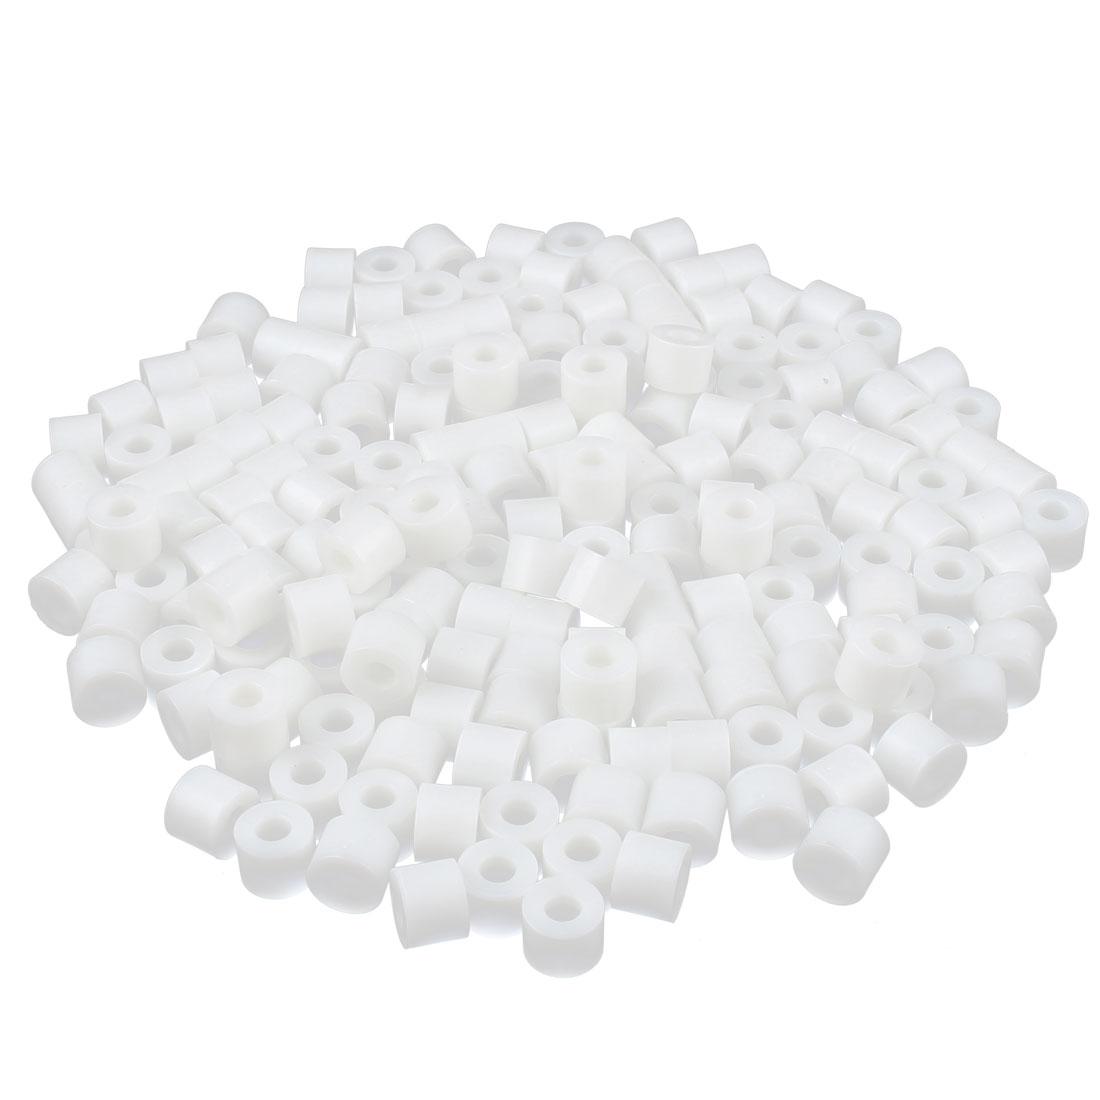 200 Pcs 11x9x5mm Plastic Round Flat Standoff Washer Insulation Metric Gasket Beige